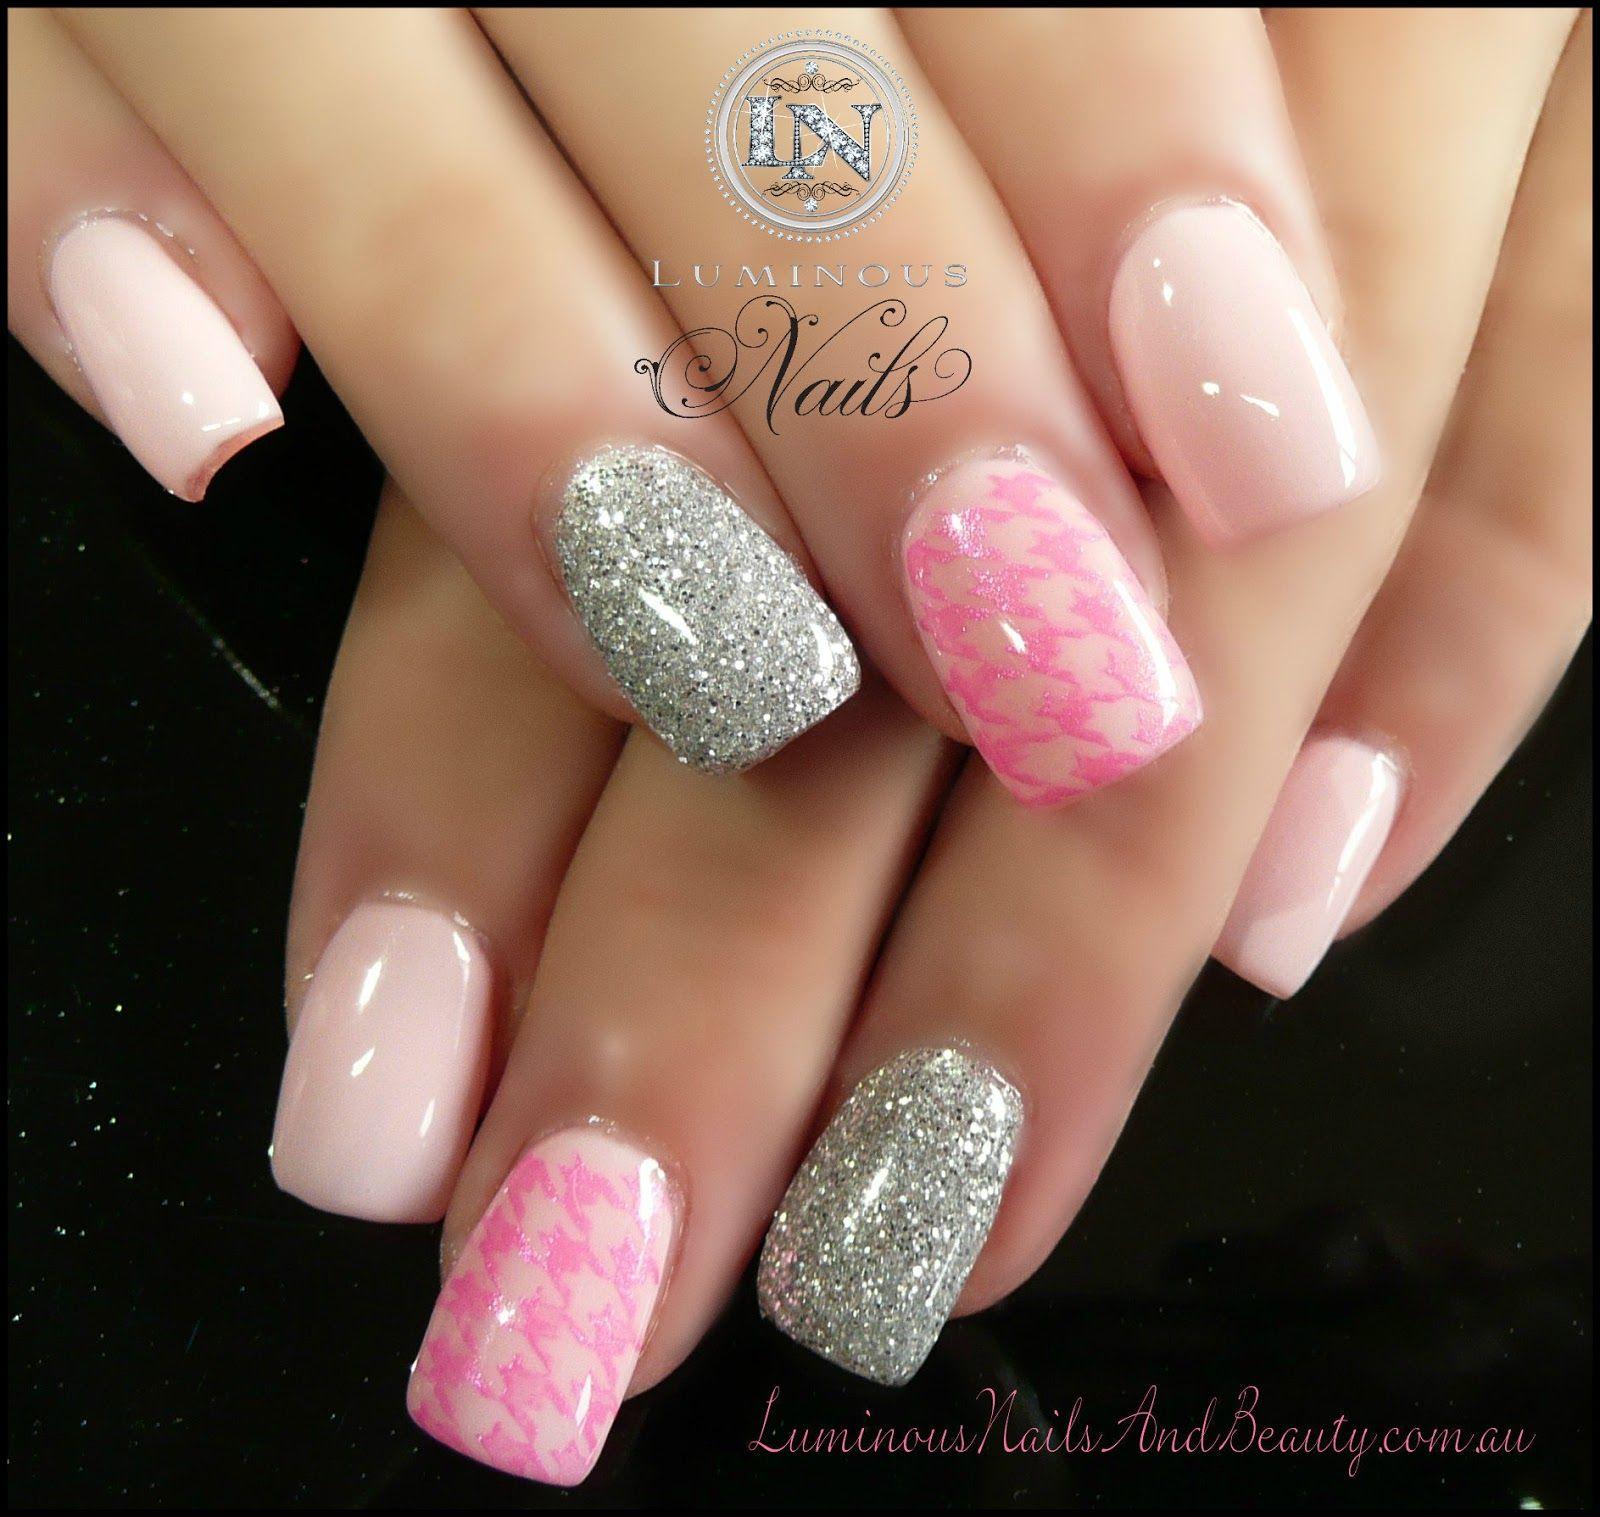 20 pretty nail designs for this new season fashion diva design 20 pretty nail designs for this new season prinsesfo Gallery